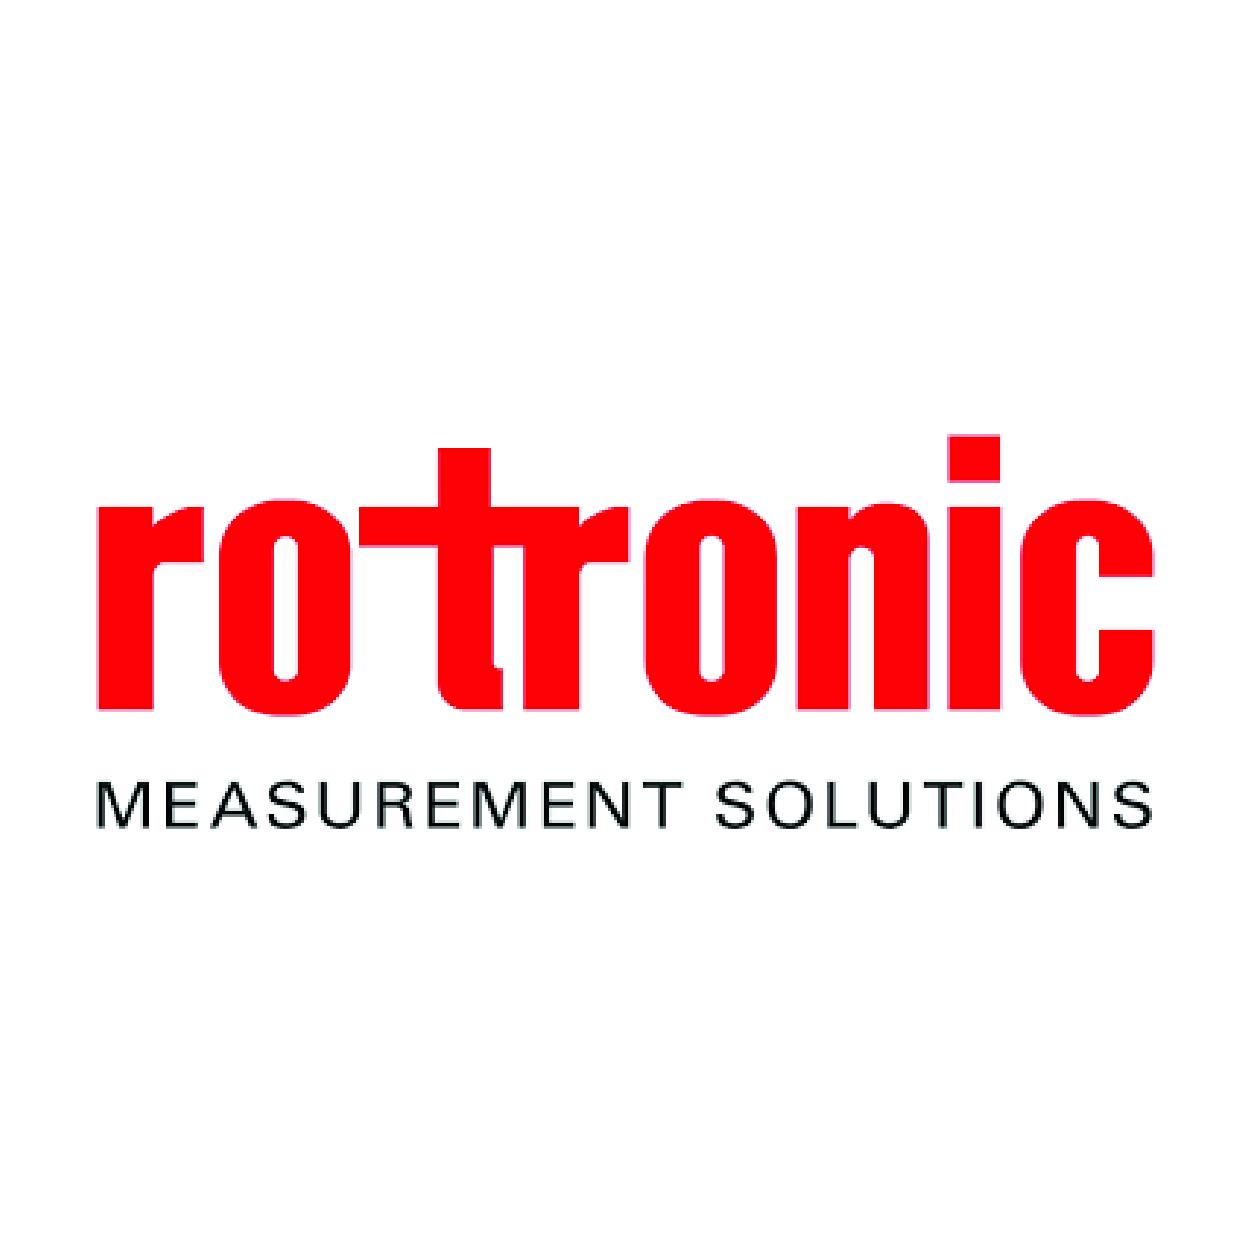 logo-rotronic-exposant-salon-forumesure-nantes-2019_Plan de travail 1